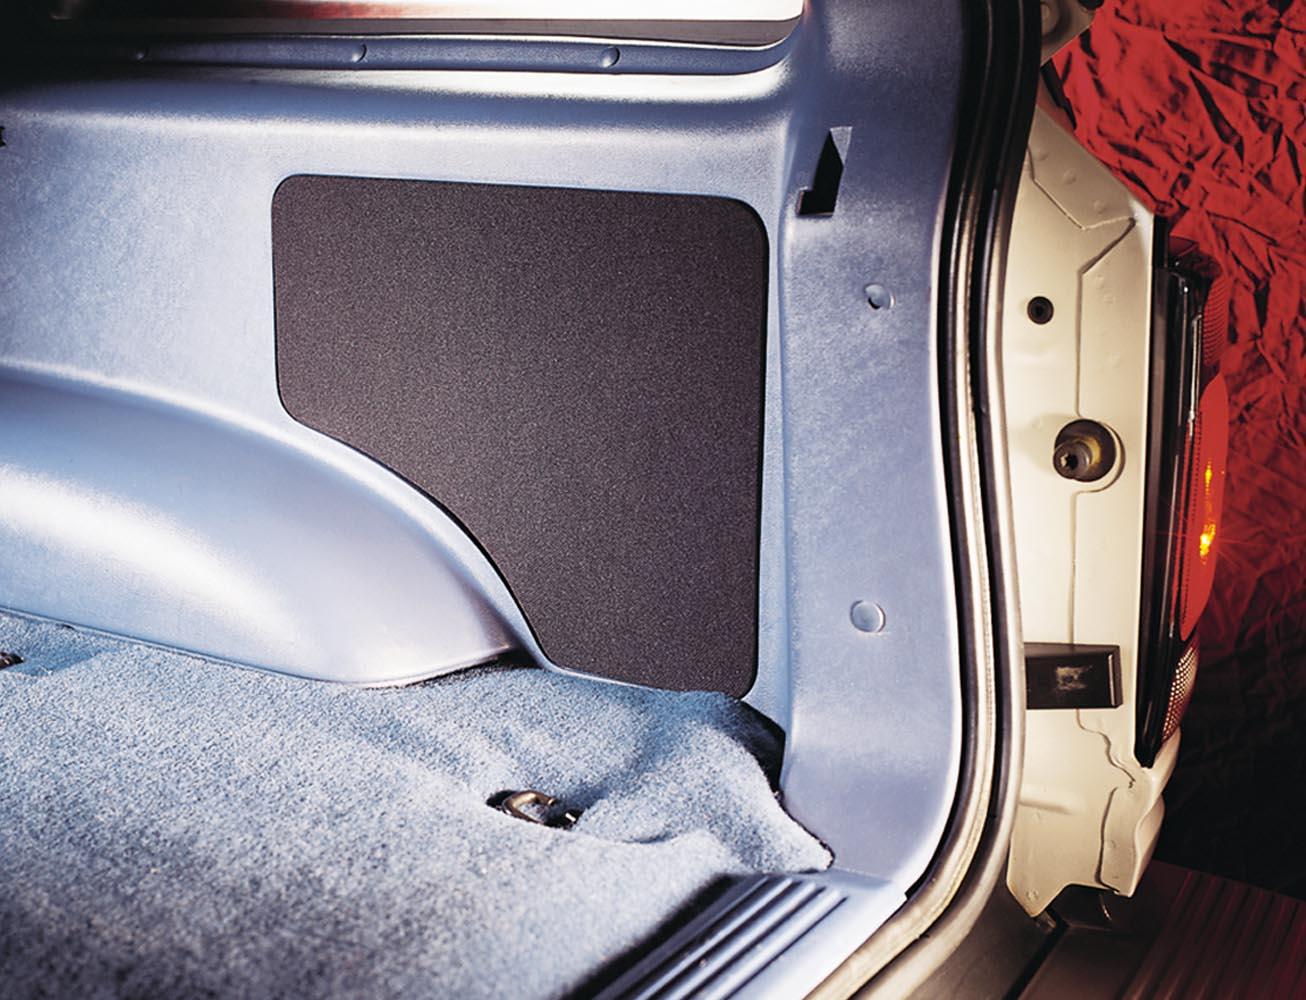 1991 Mazda Navajo California Fuse Box Diagram Fits Ford Explorer Amplified Inch Vehicle Specific Custom Subwoofer Enclosure 1306x1000